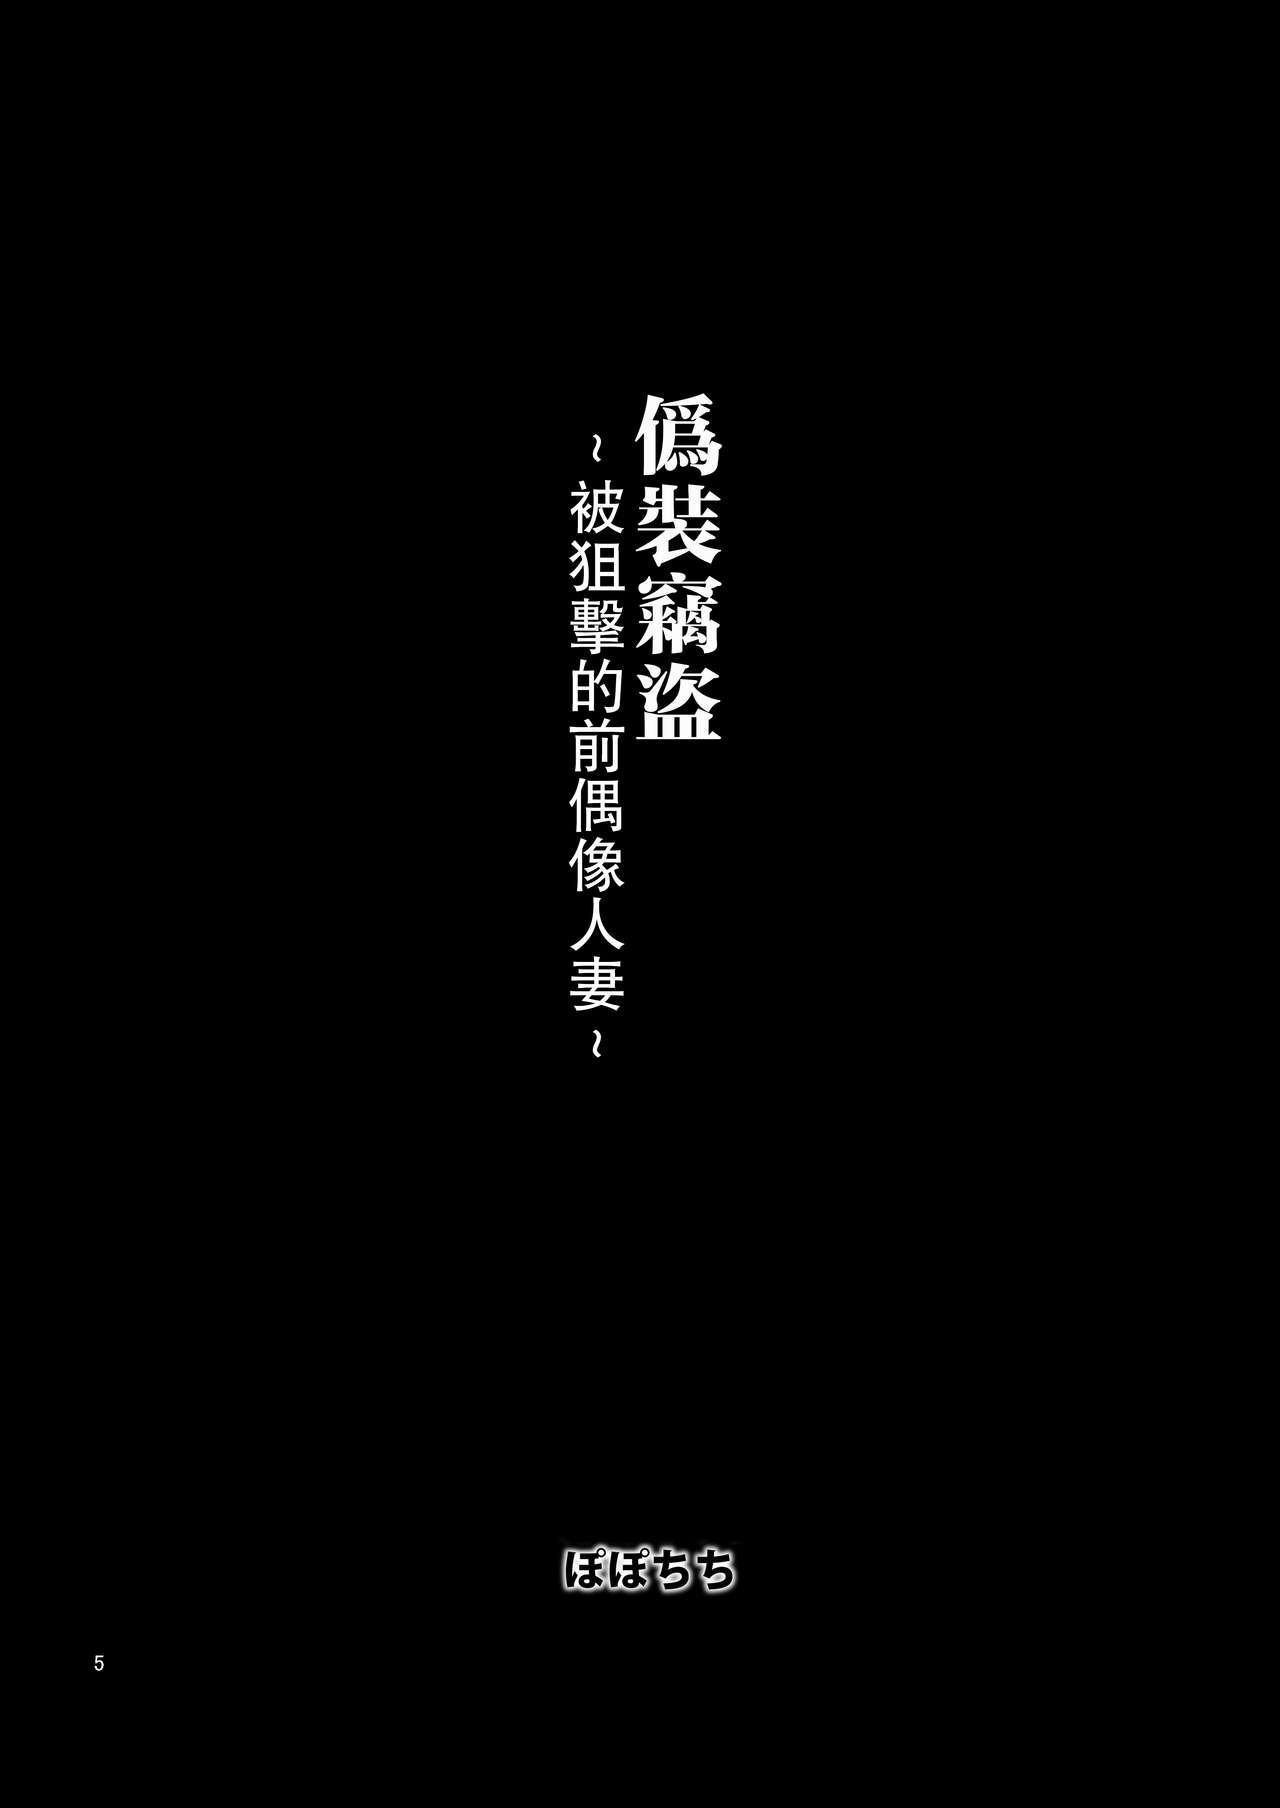 [Popochichi (Yahiro Pochi)] Gisou Manbiki ~Nerawareta Moto Idol Tsuma~ | 偽裝竊盜~被狙擊的前偶像人妻~ [Chinese] [路过的骑士汉化组] [Digital] 4